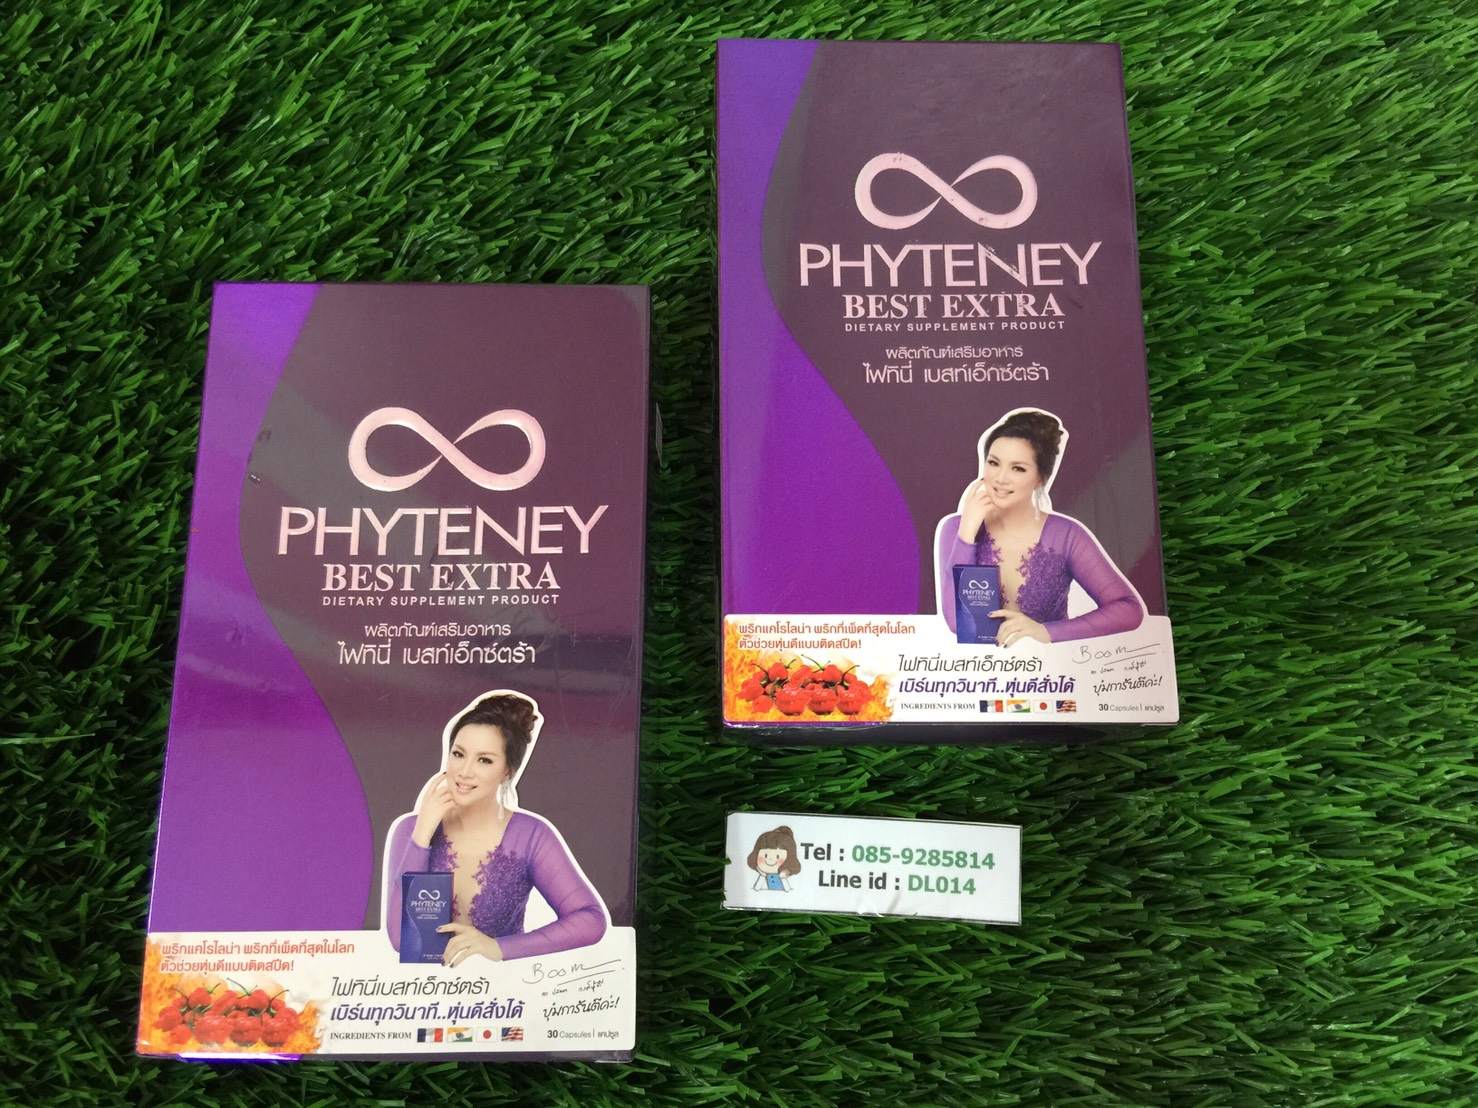 Phyteney Best Extra ไฟทินี่ เบสท์ เอ็กซ์ตร้า ชีวิตดี๊..ดี หุ่นดีสั่งได้ ปลอดภัย100%